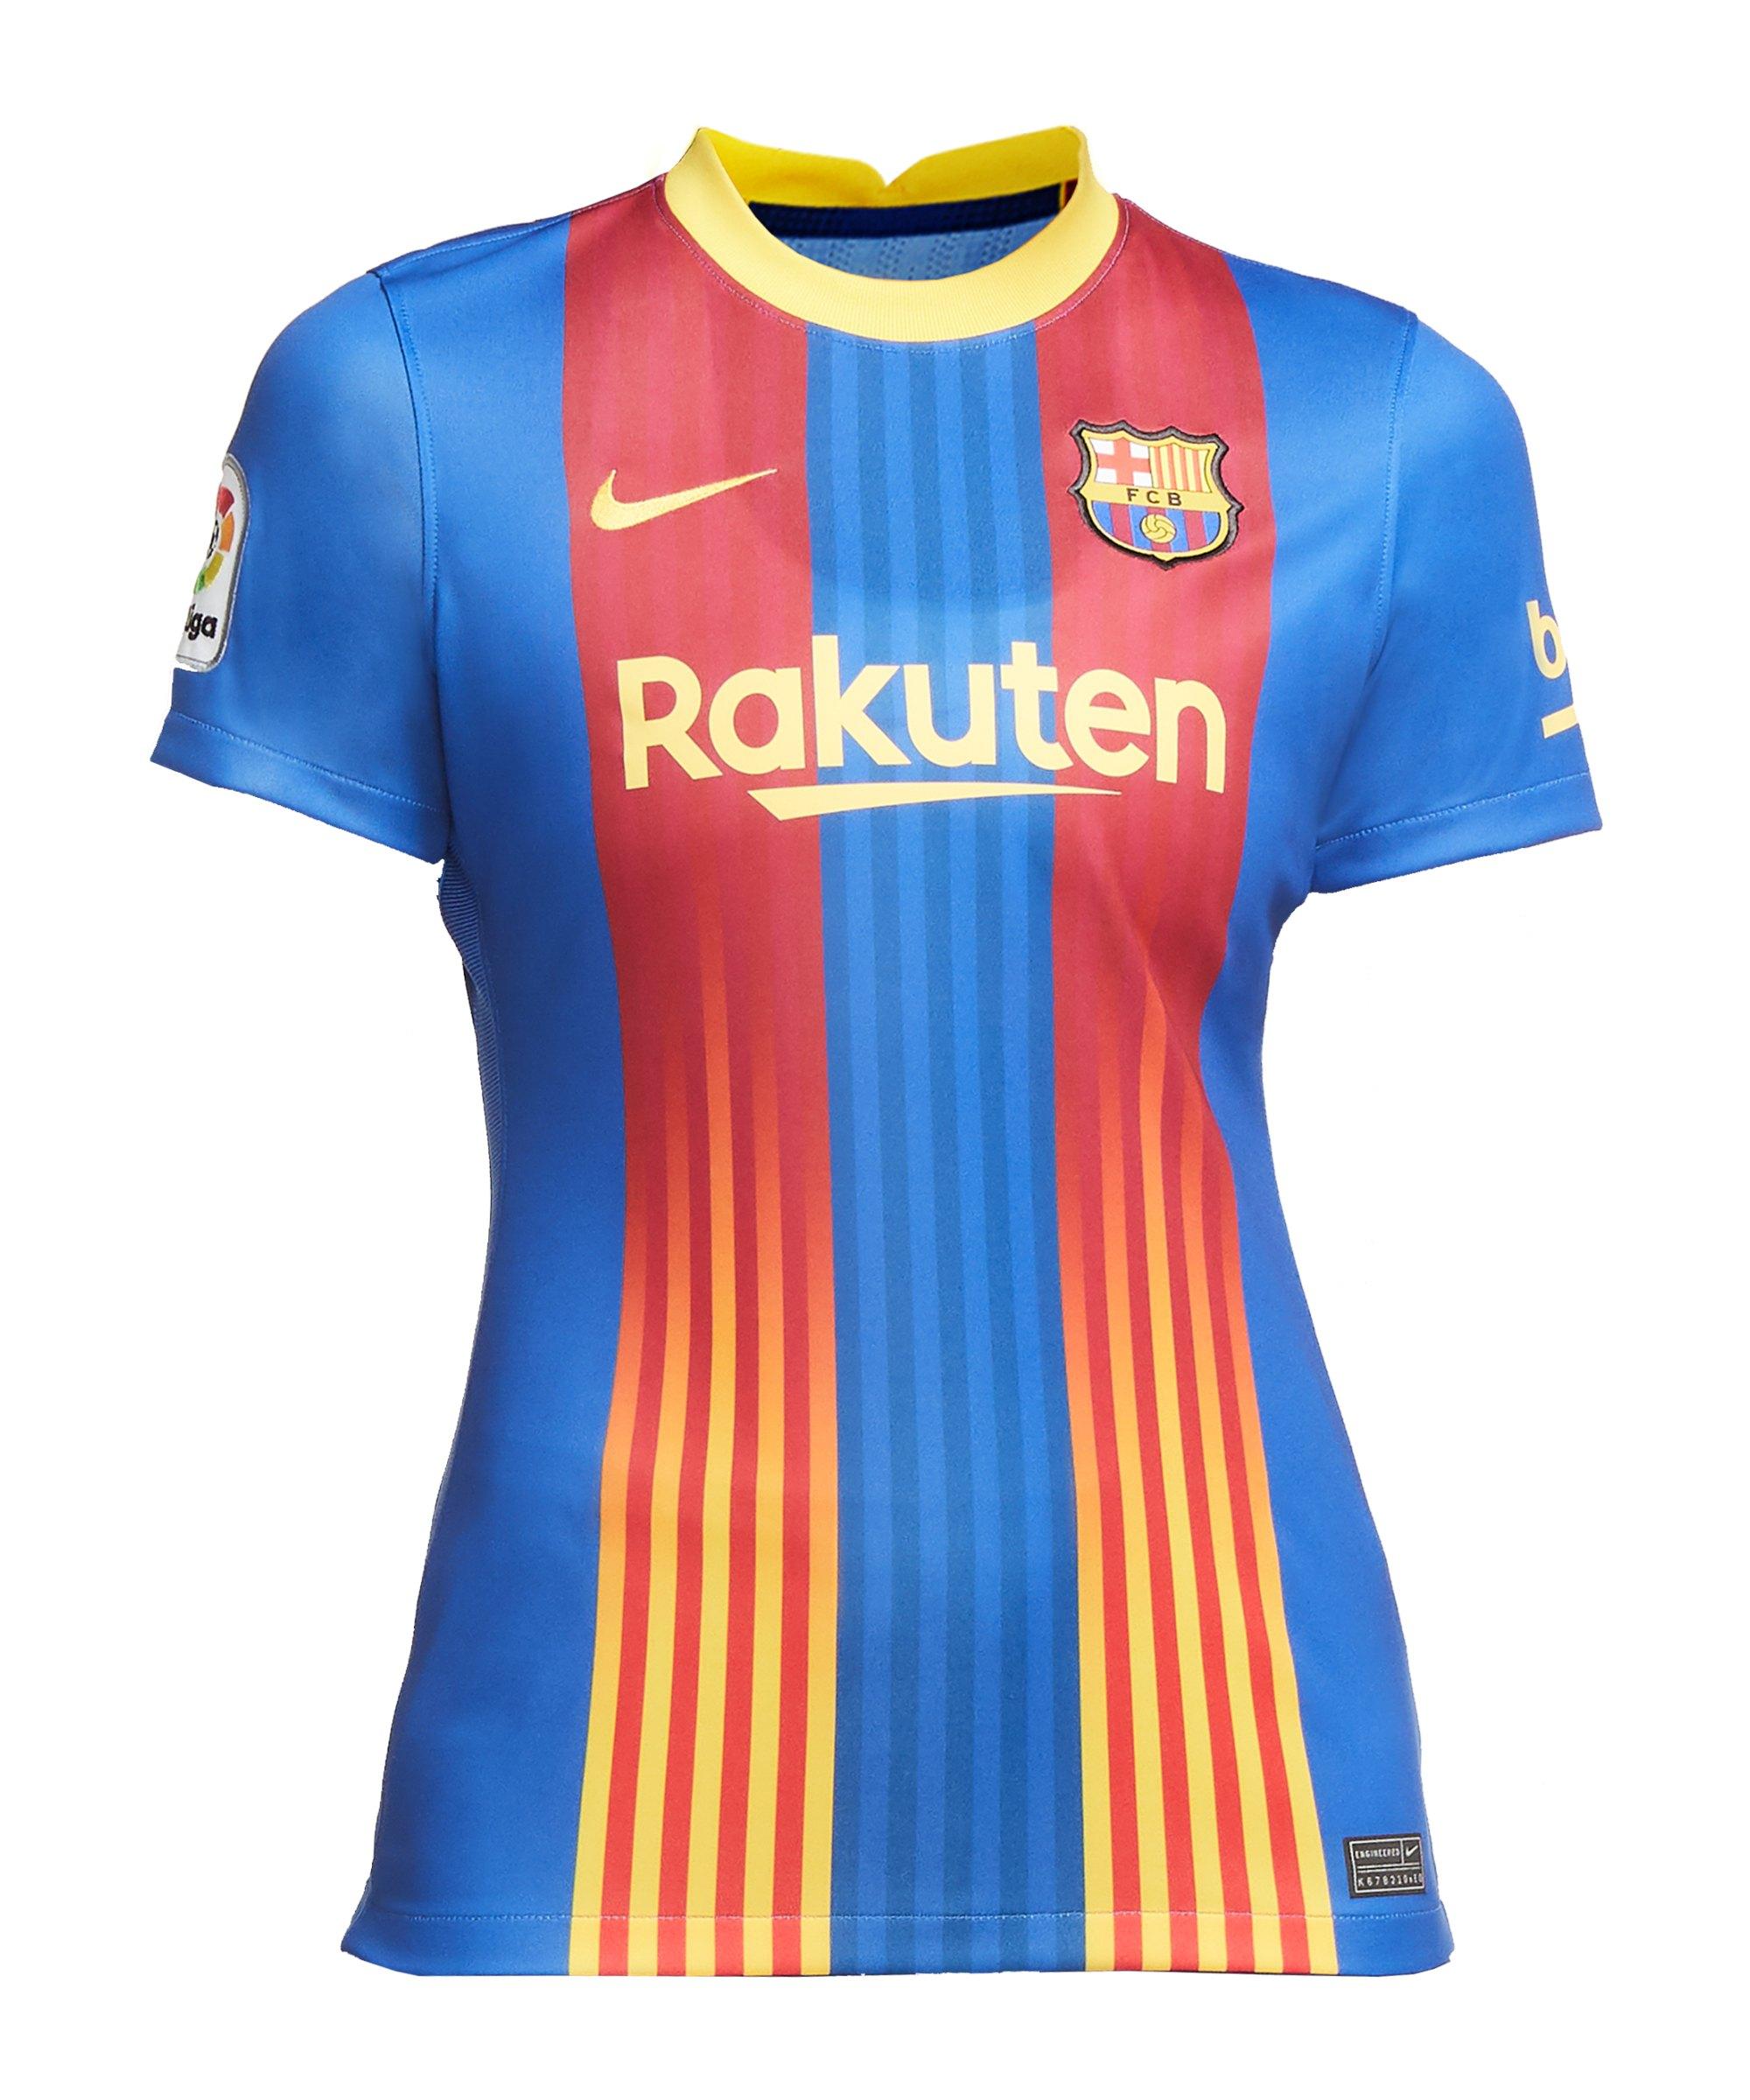 Nike FC Barcelona Trikot El Clásico 2020/2021 Damen Blau F481 - blau